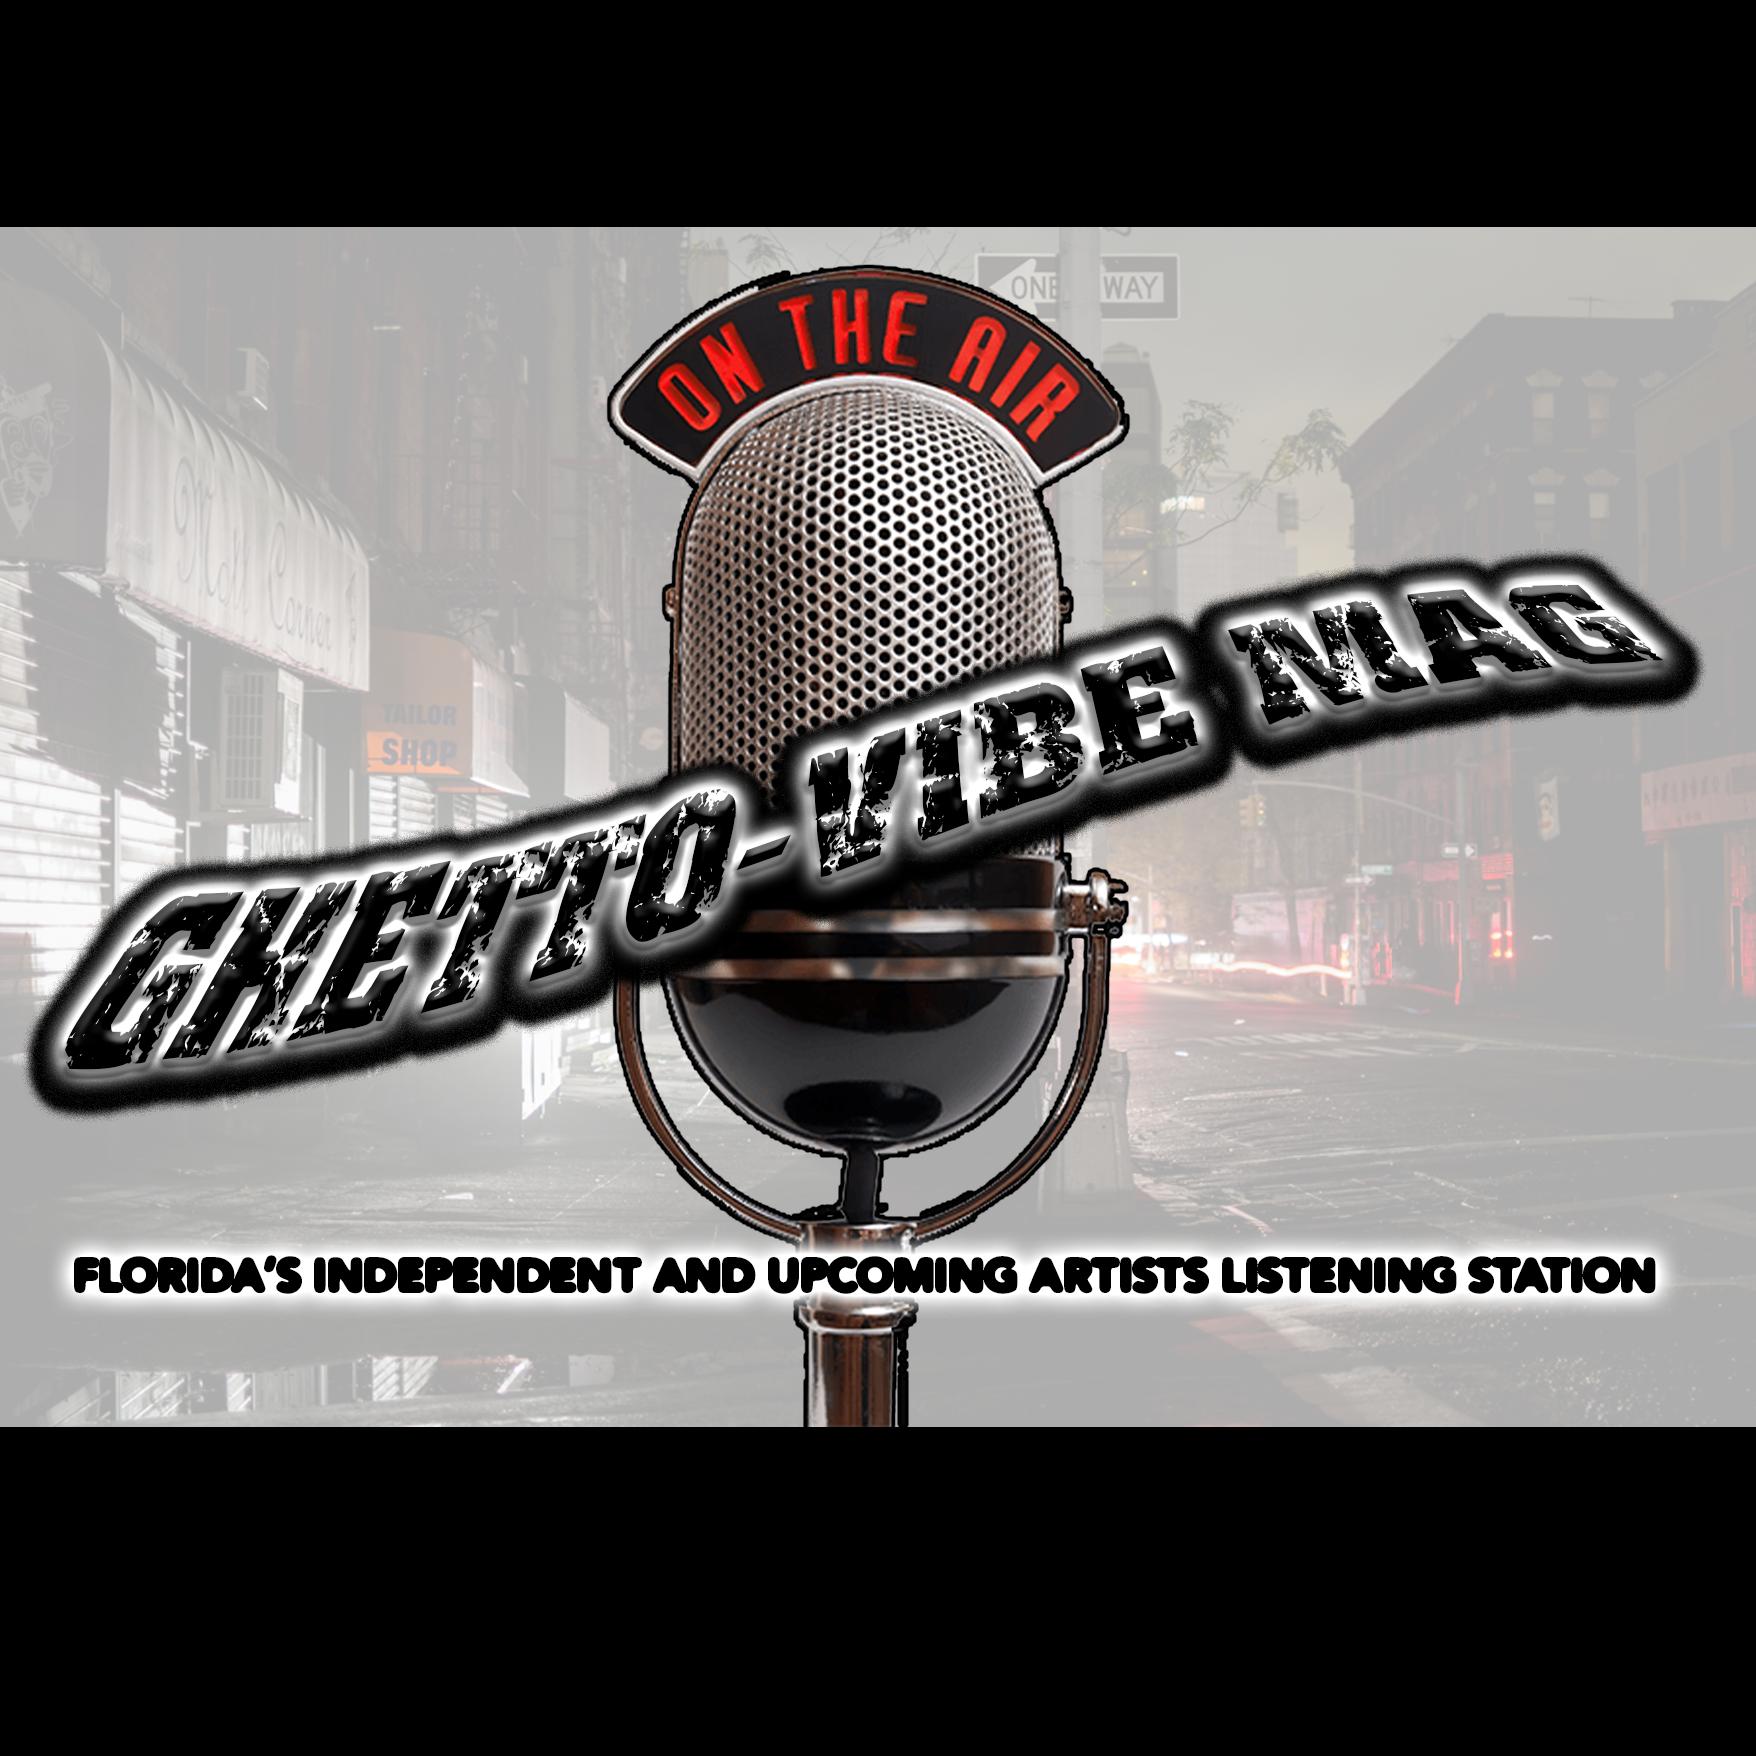 Ghetto-Vibe Mag/Radio